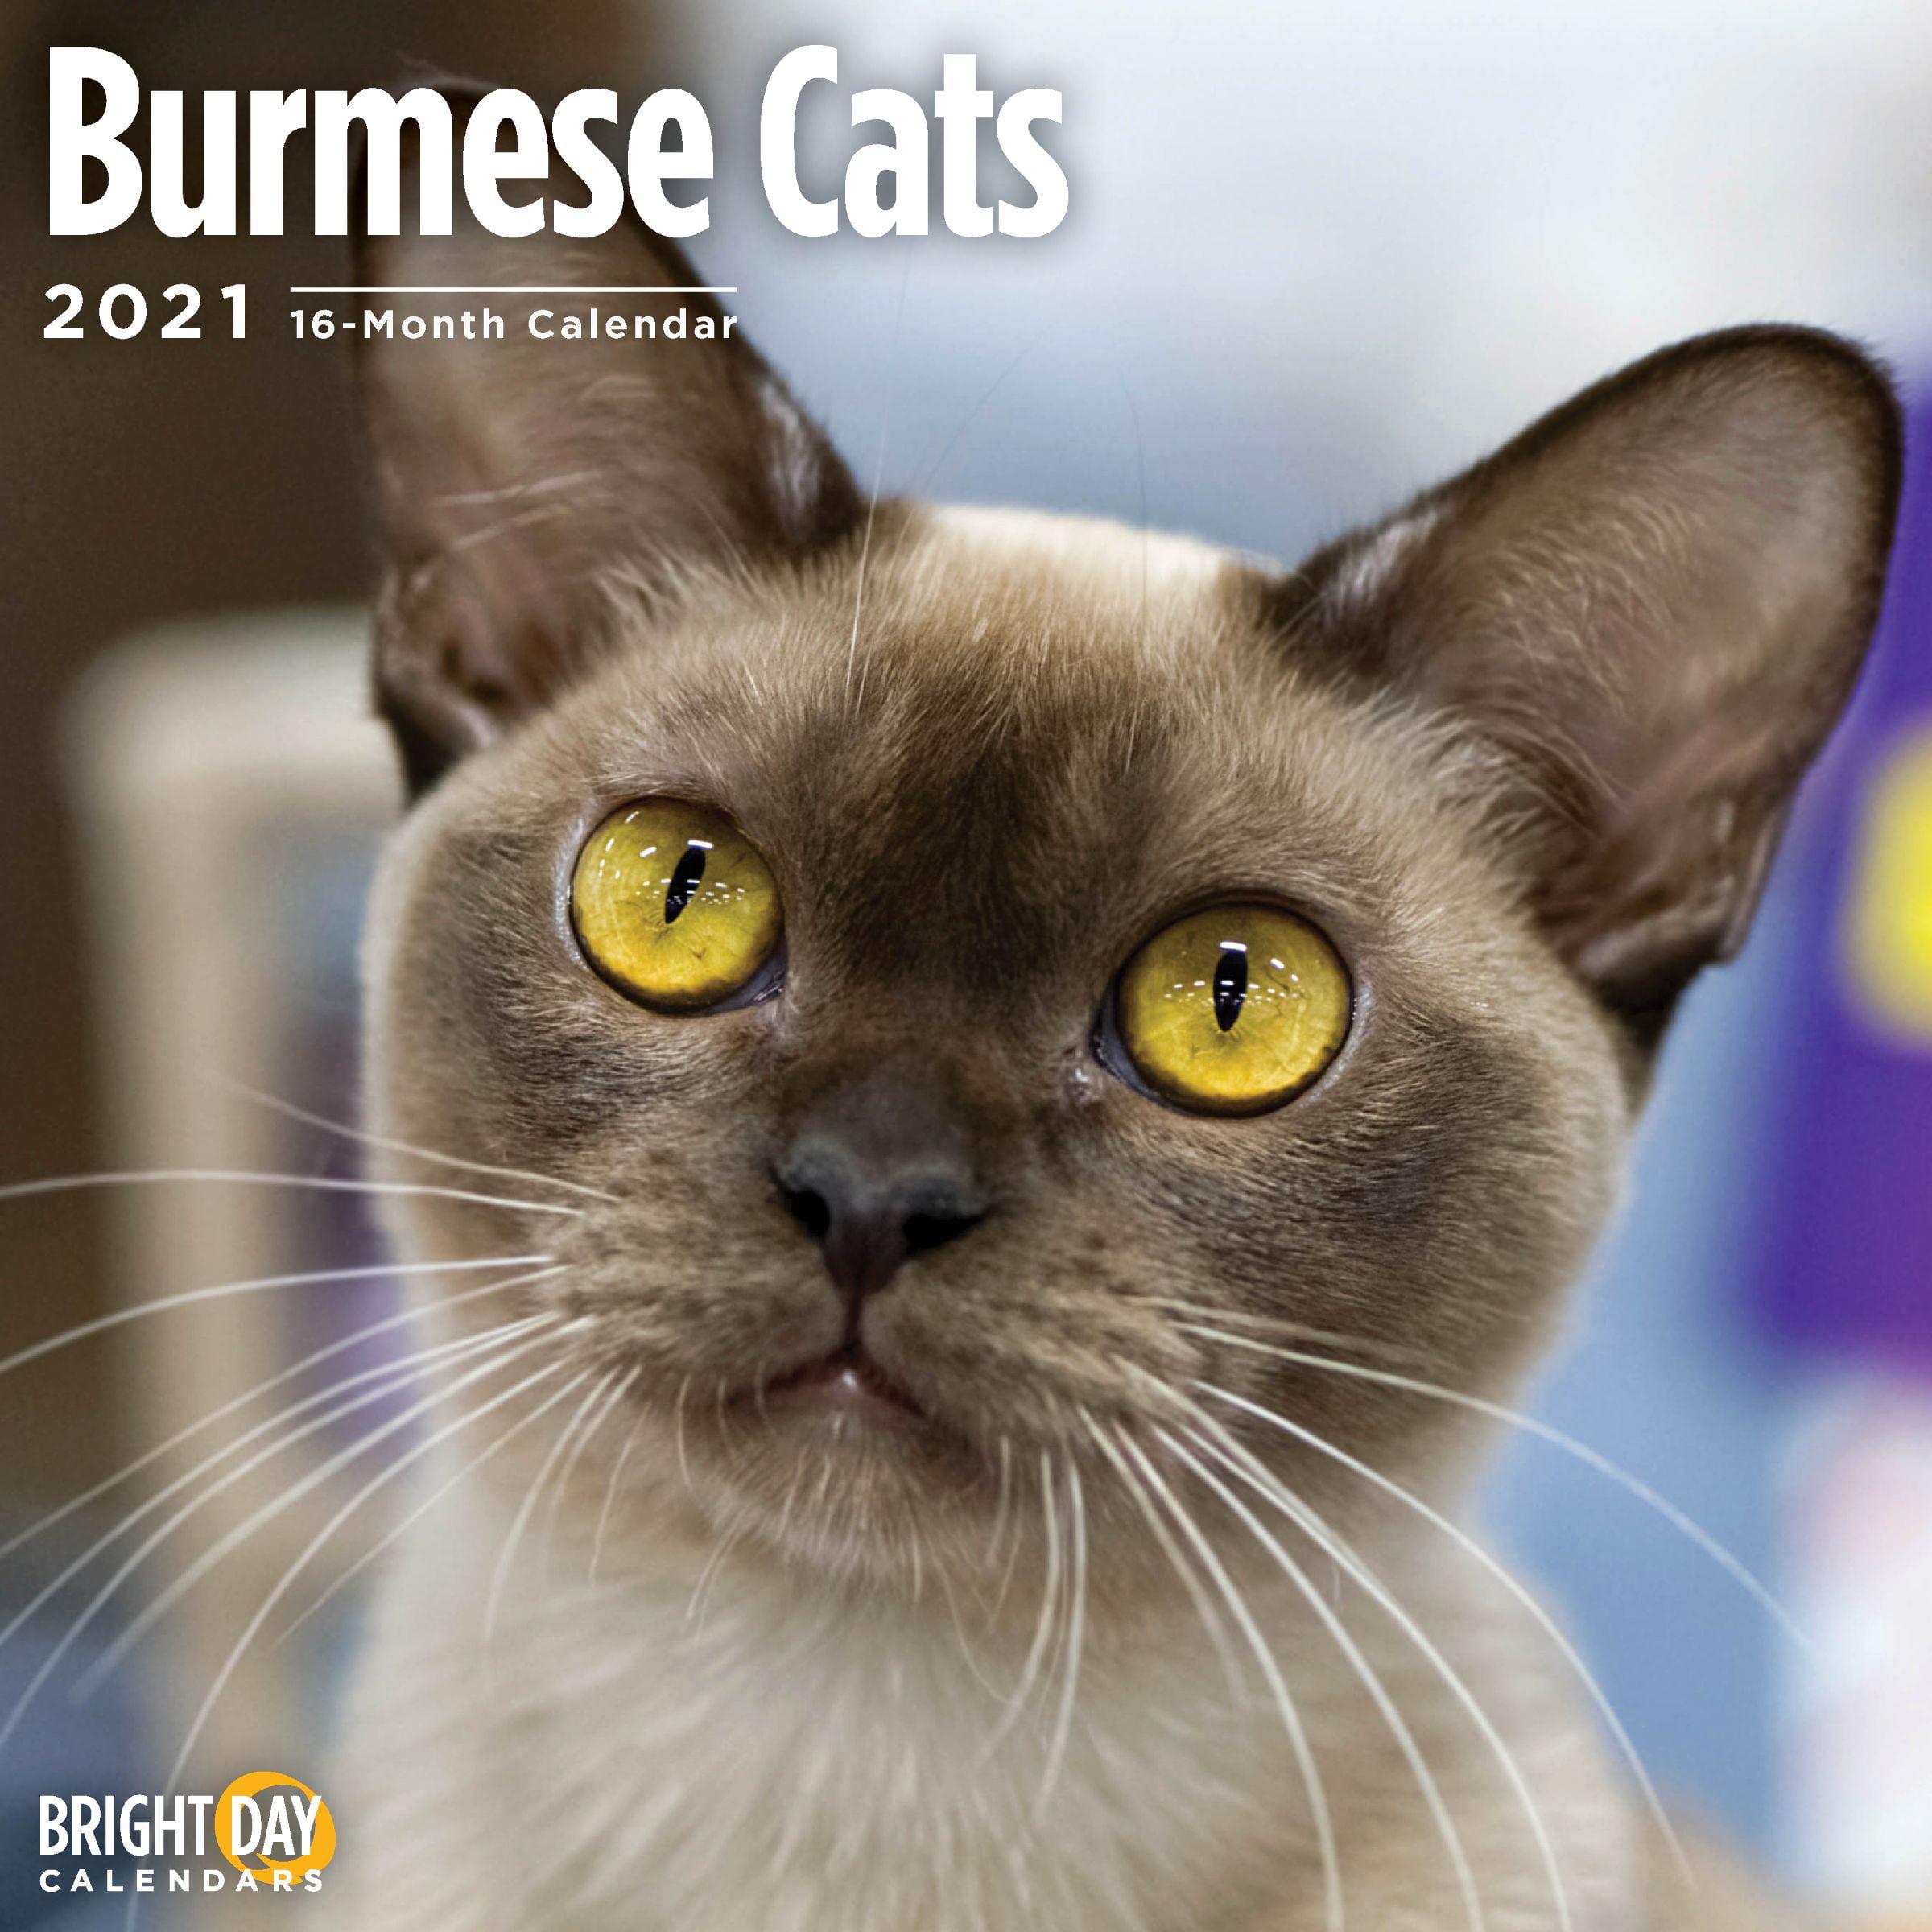 2021 Burmese Cats Wall Calendar - Walmart.com - Walmart.com